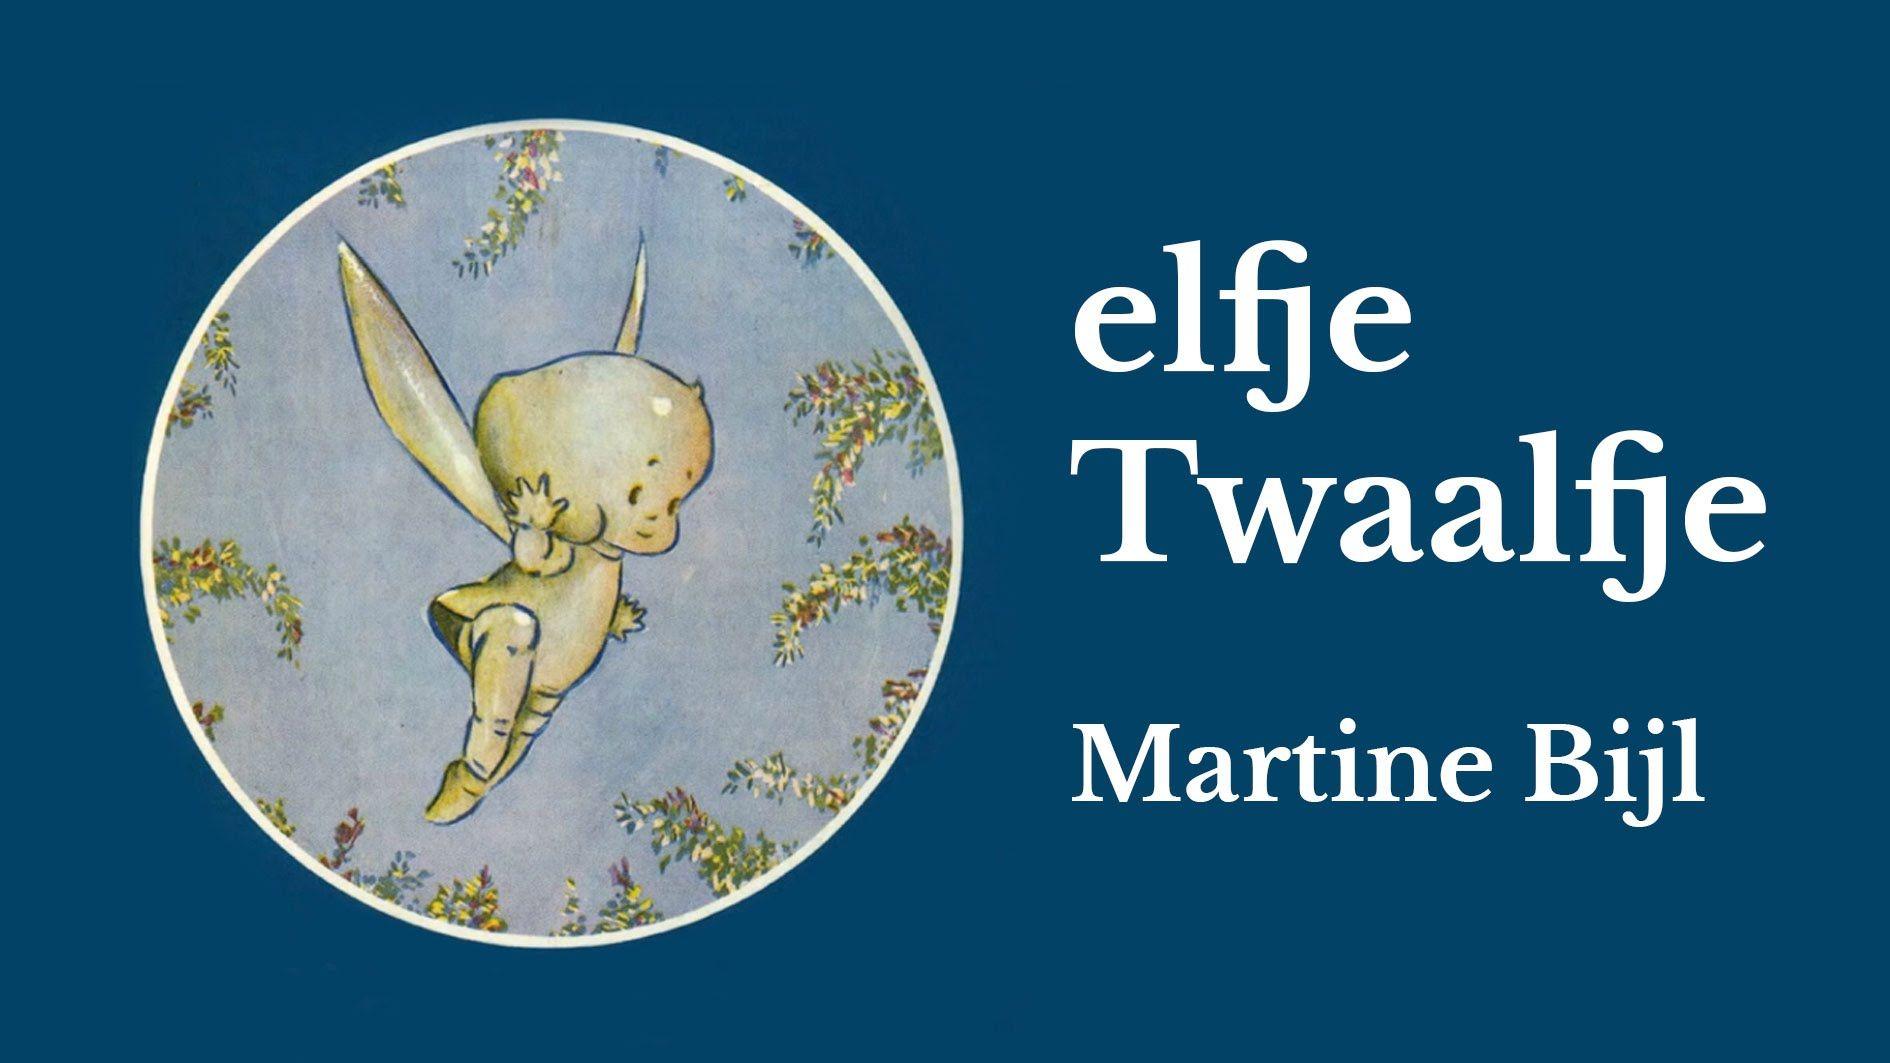 Elfje Twaalfje Martine Bijl Elfen Thema Sprookjes